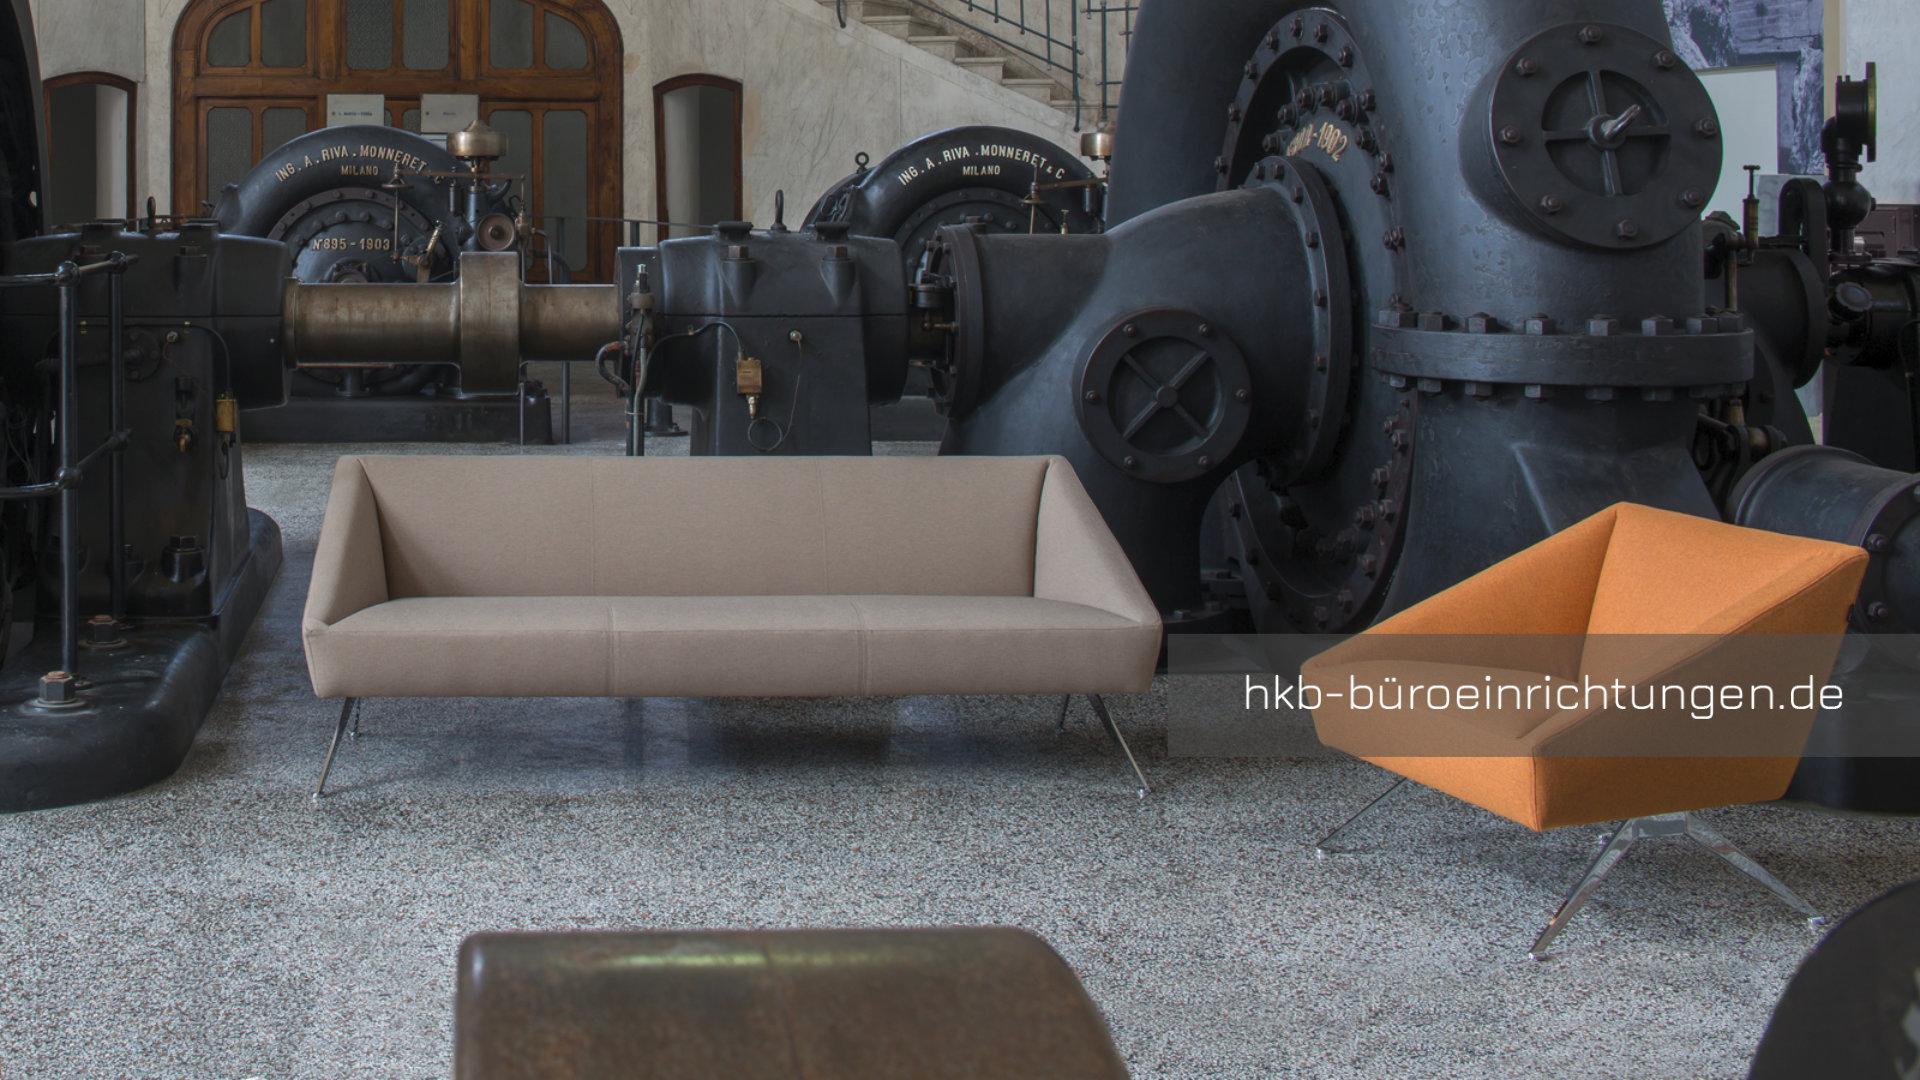 Full Size of Günstige Sofa Sessel Hkb 55 Gnstige Polstermbel Bro Günstig Kaufen Stoff Grau Grünes U Form Ewald Schillig Konfigurator Türkis Modulares Big Mit Sofa Günstige Sofa